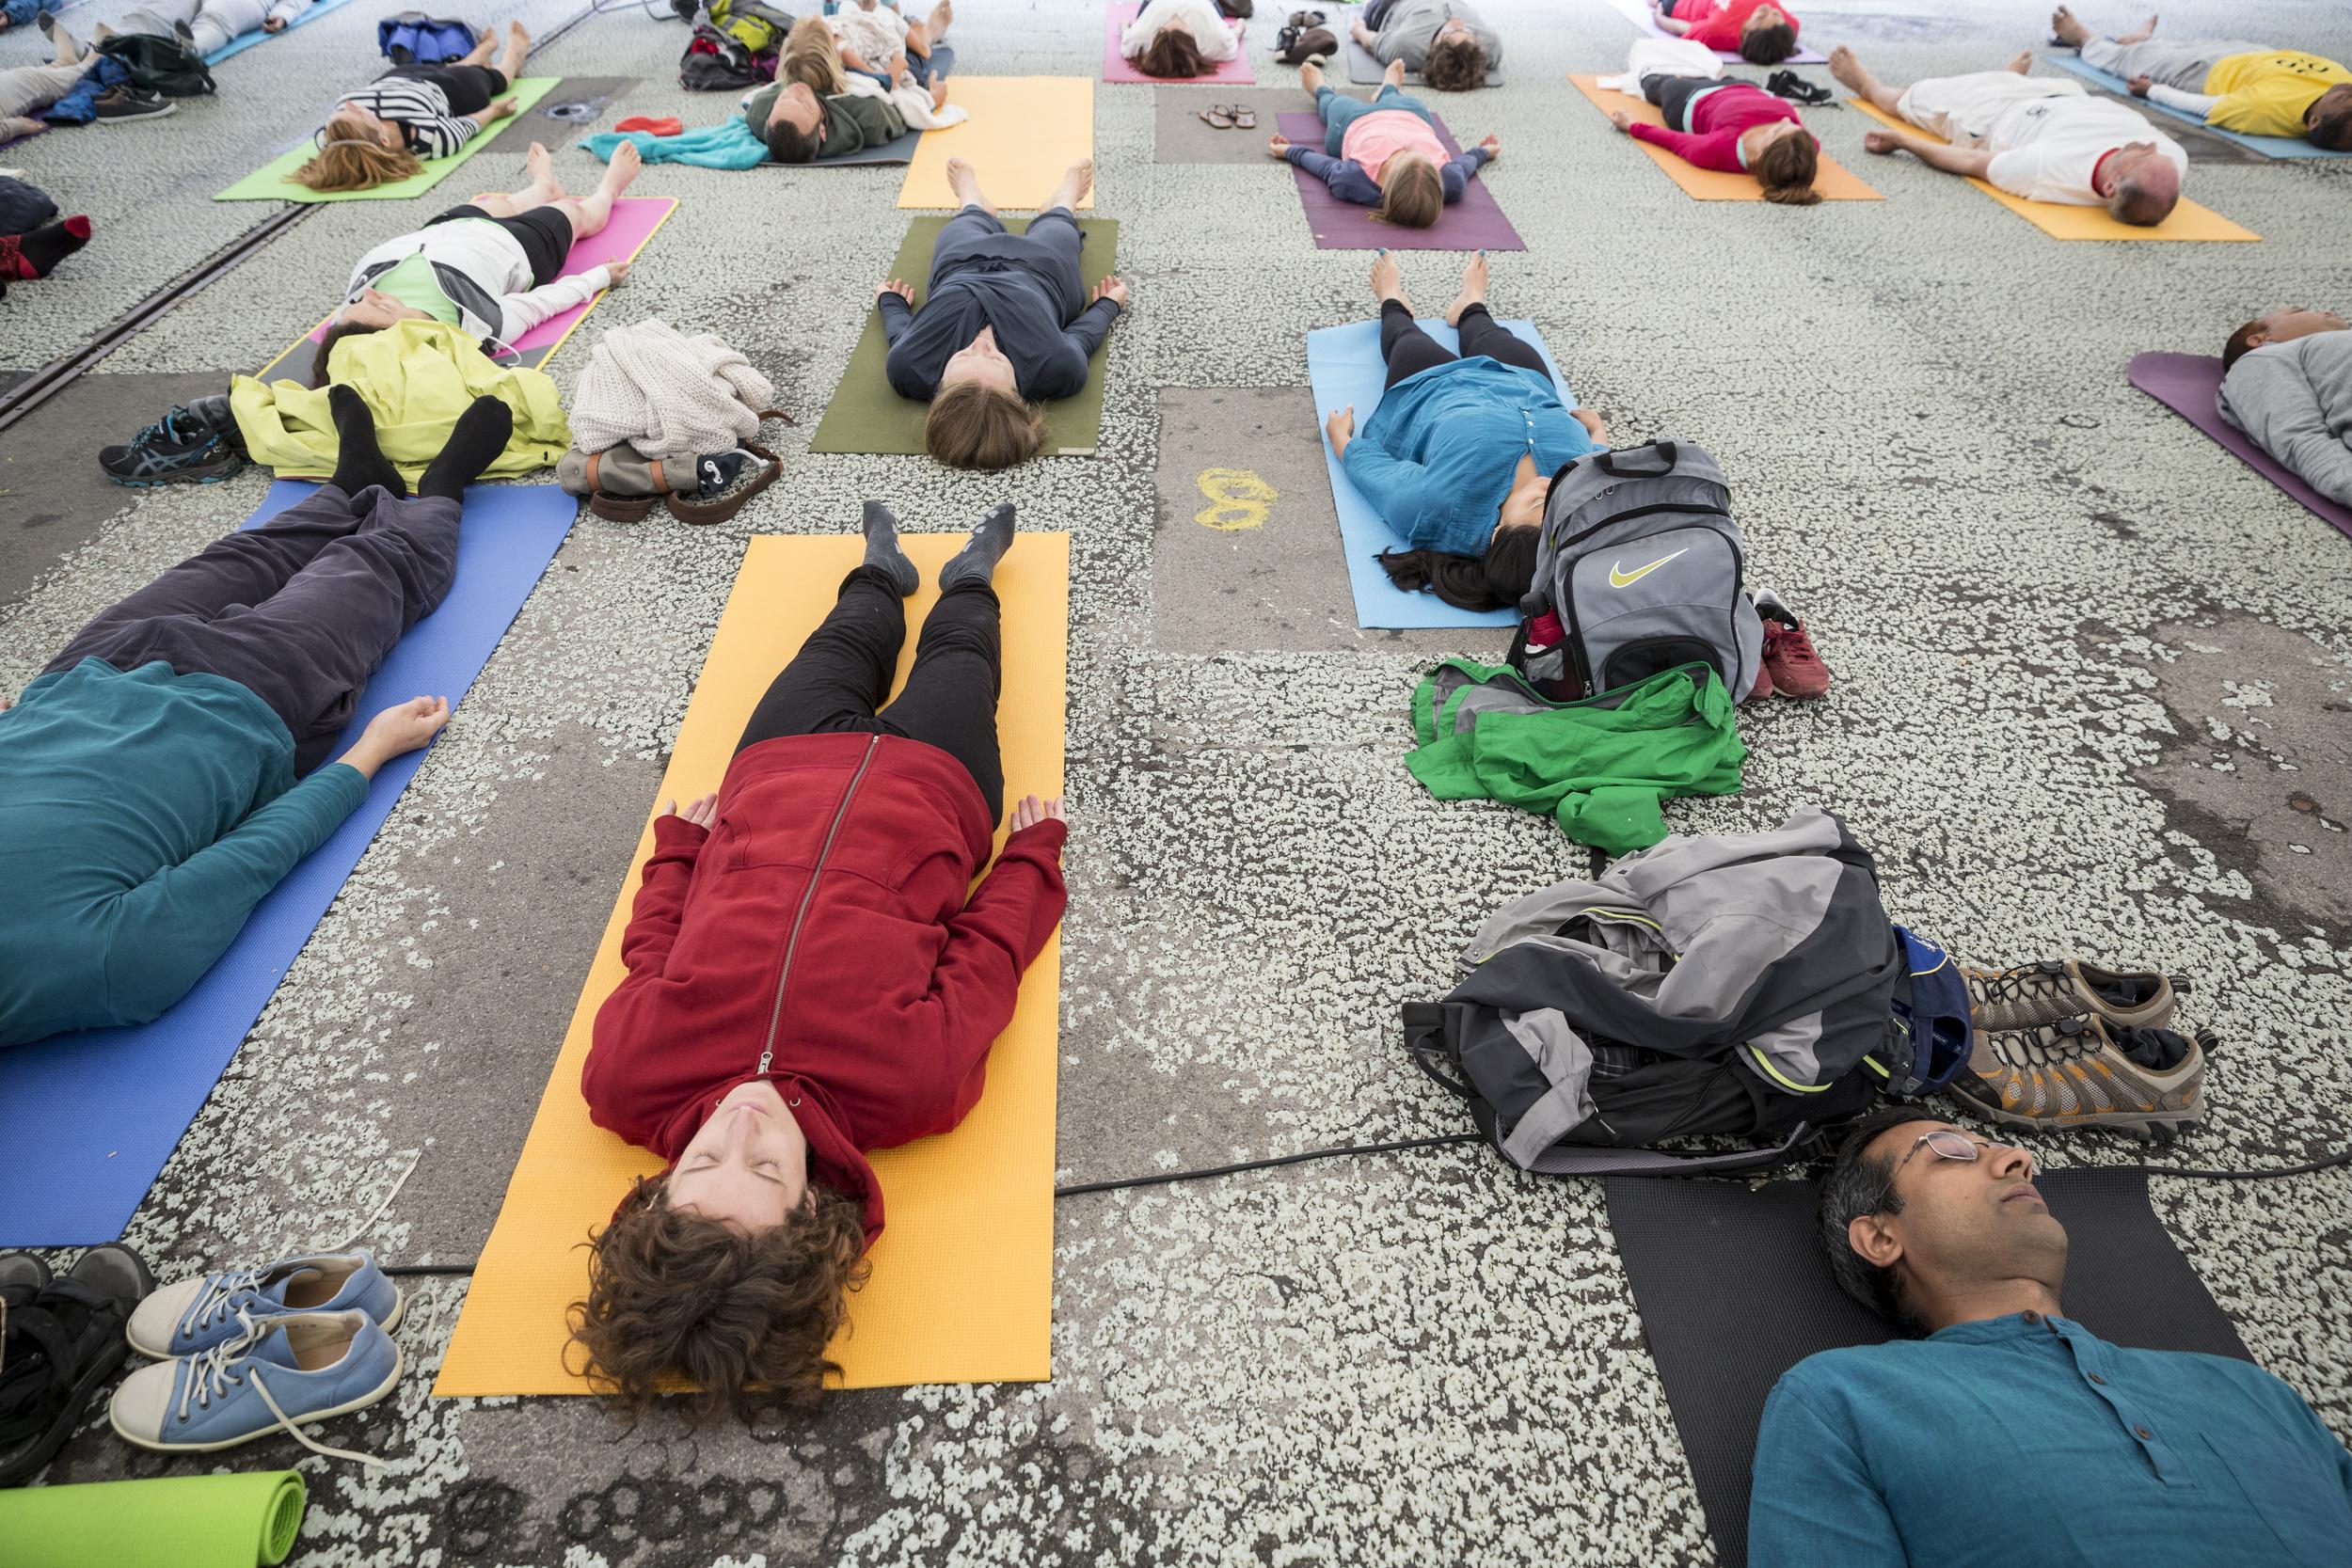 uno-day-of-yoga_19034898501_o.jpg